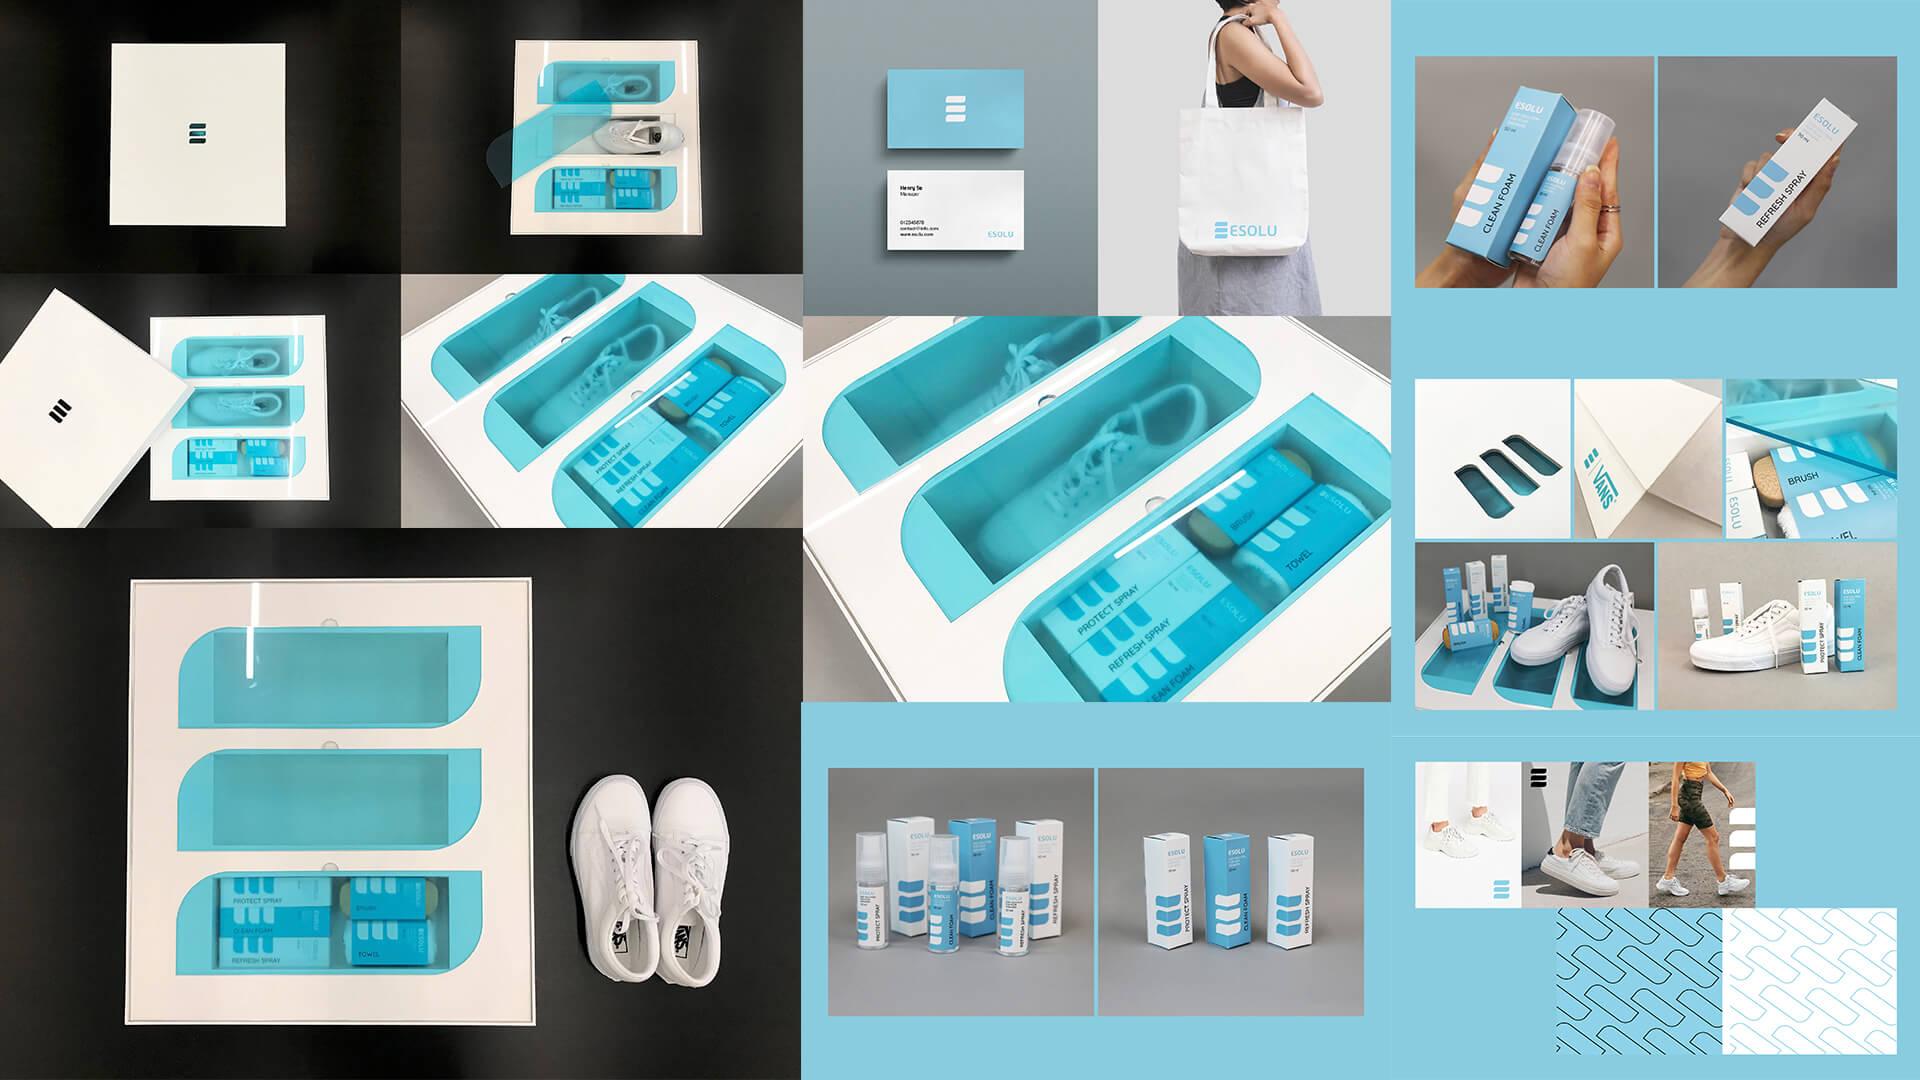 Indigo Design Awards 2021 Gao Xiao Xuan Esolu